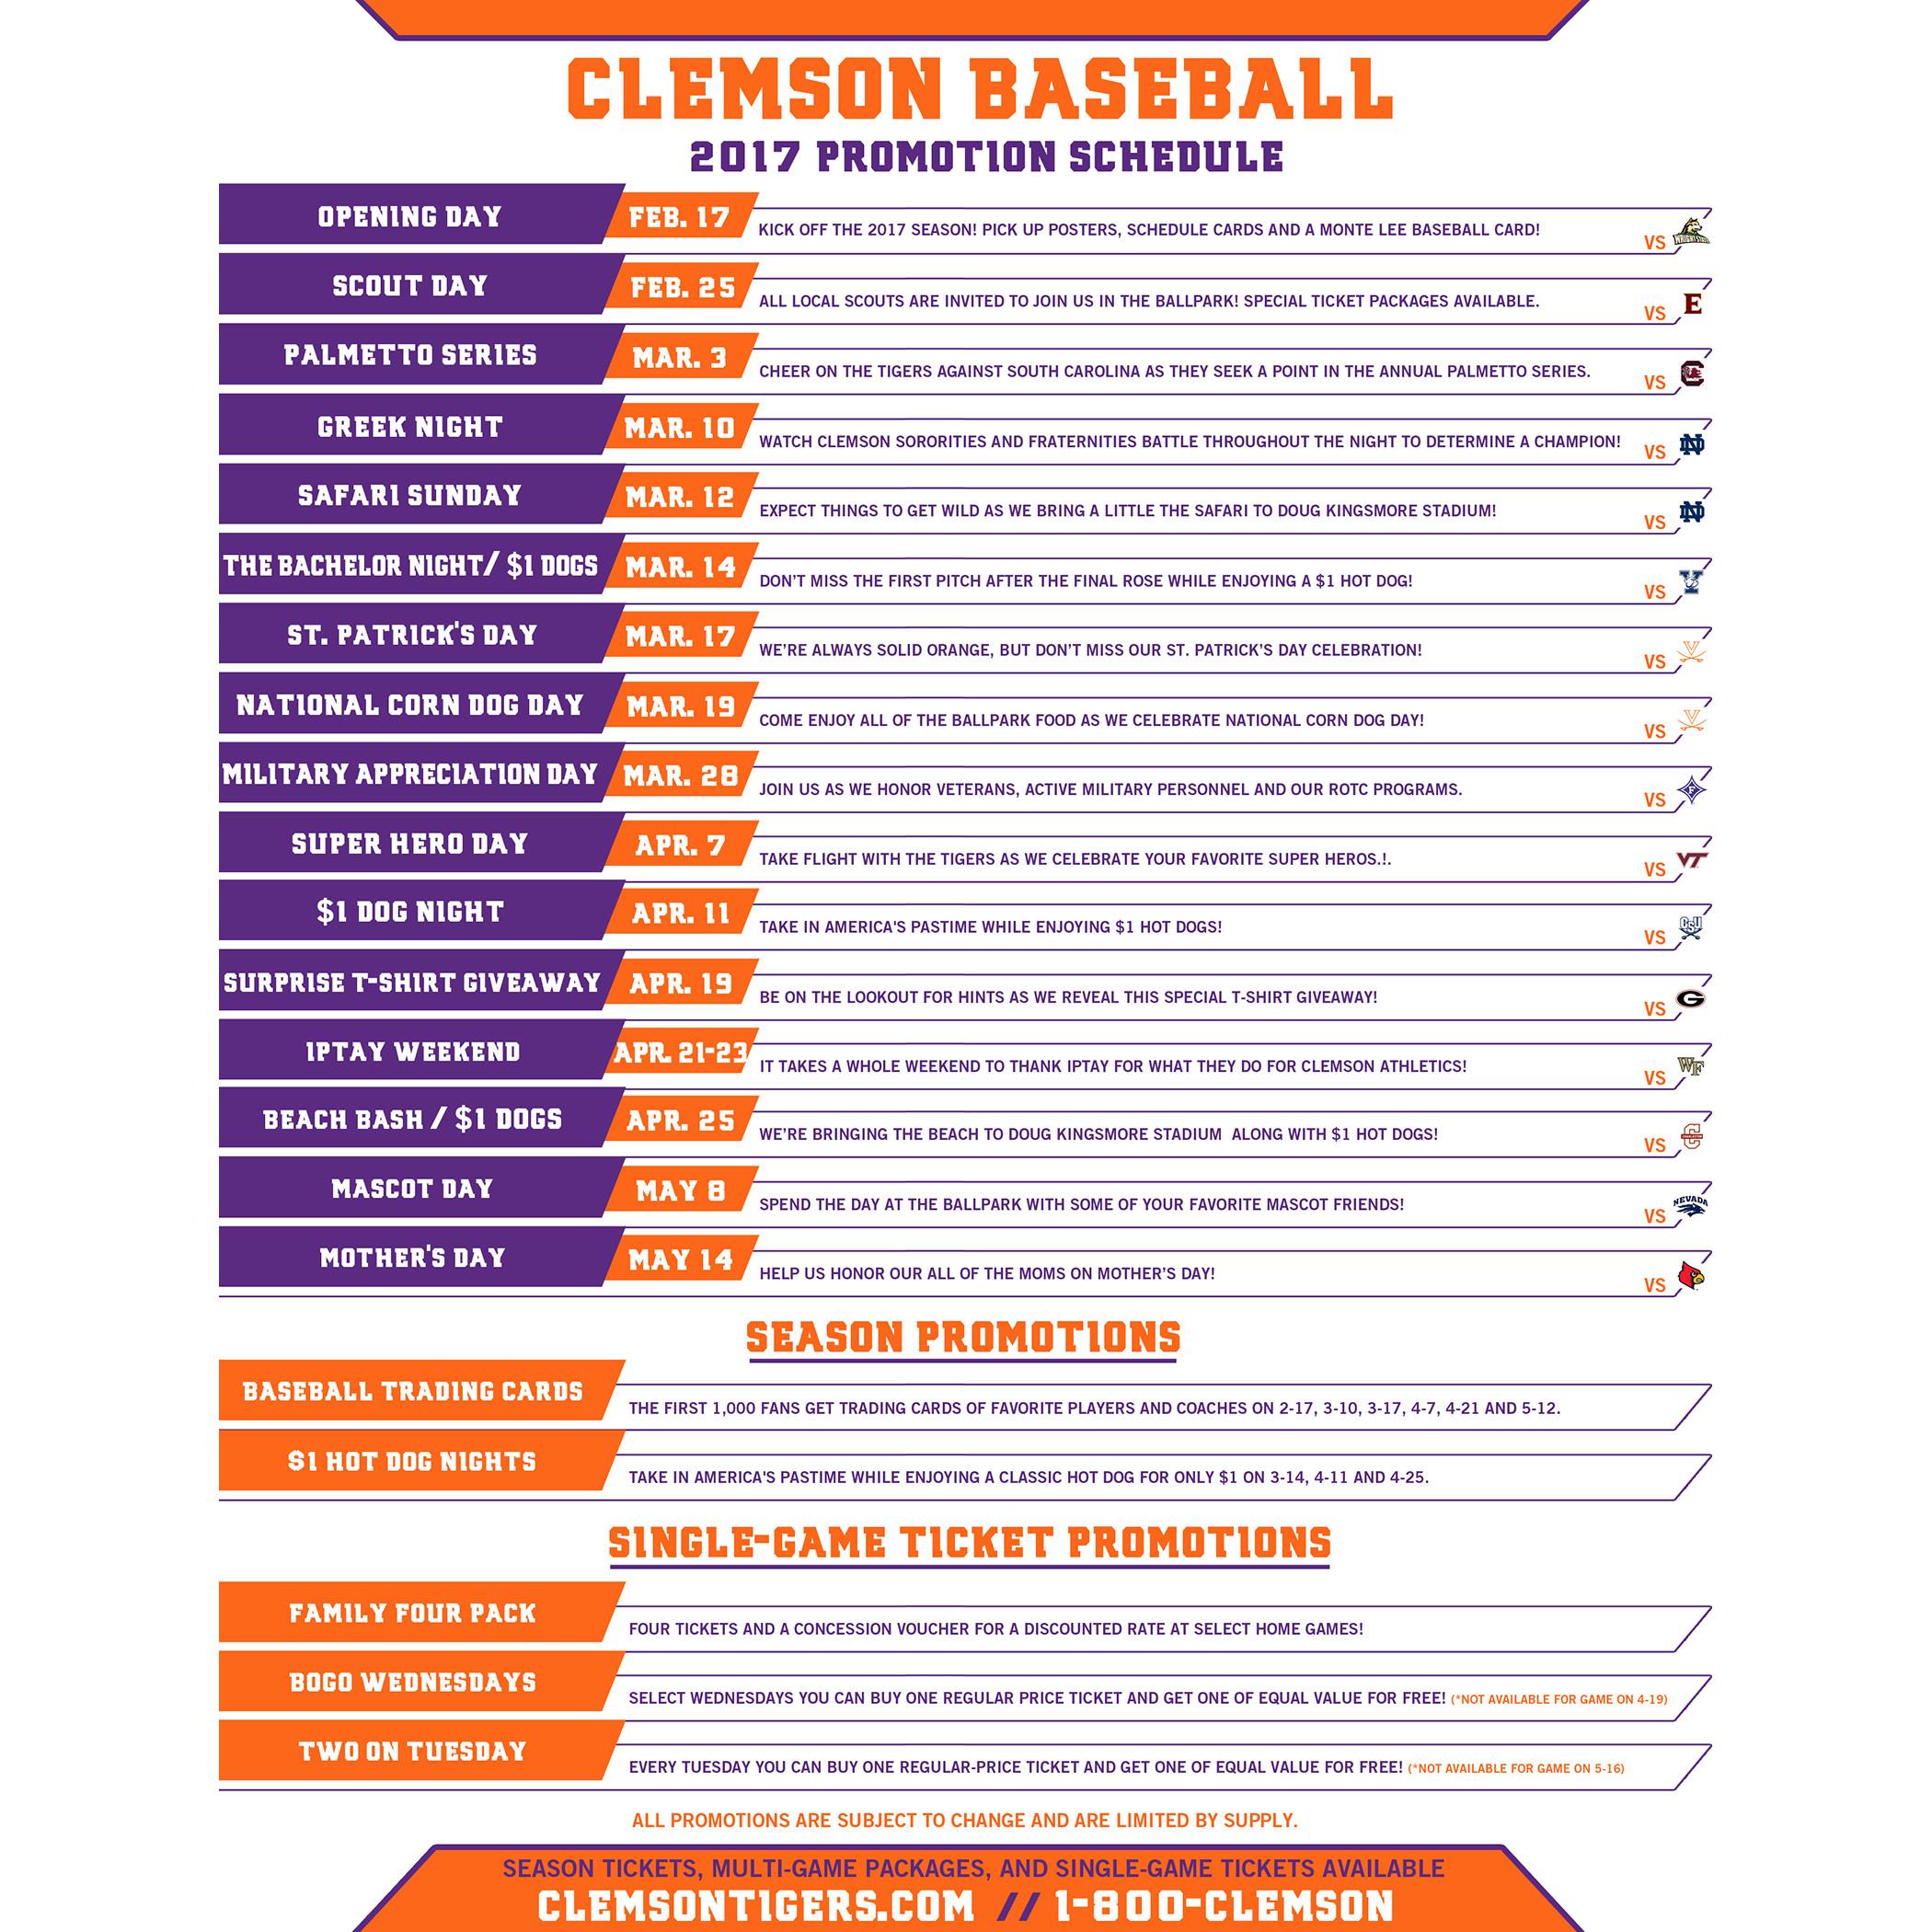 2017 Baseball Promotions